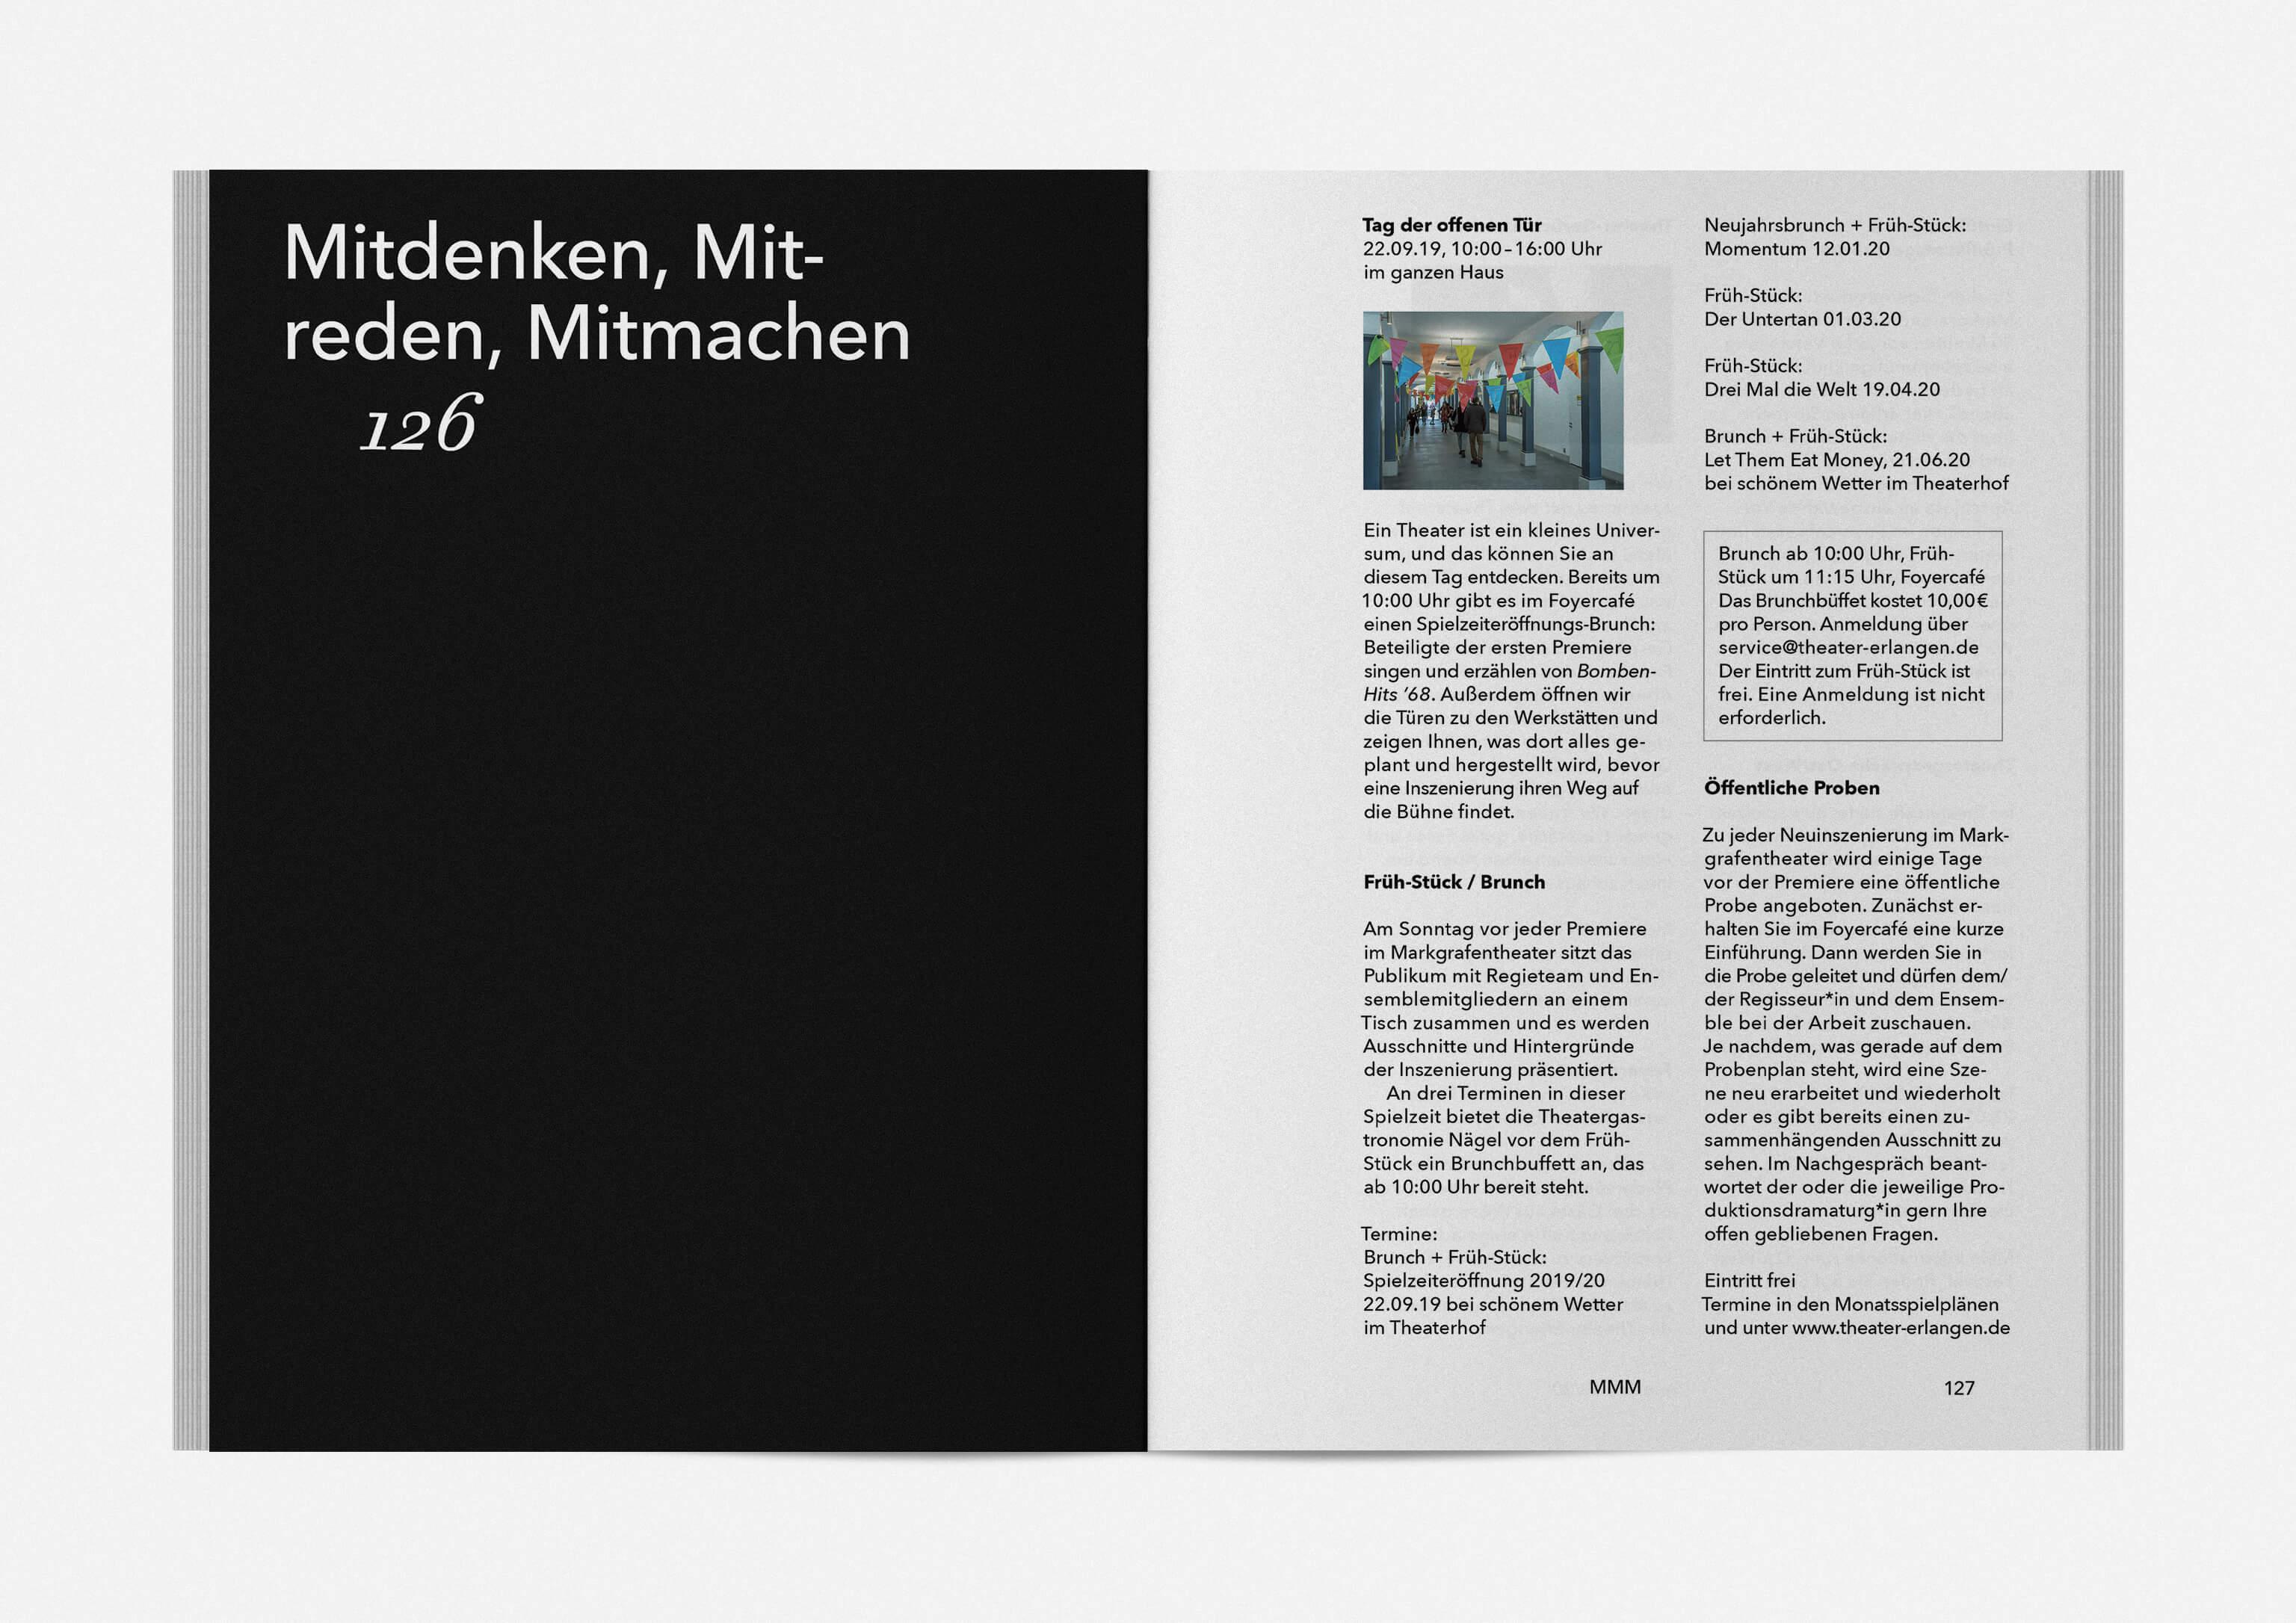 https://neuegestaltung.de/media/pages/clients/theater-erlangen-season-program-19-20/4c102d7448-1597415334/te_szh_19_20_innenseite_126_127_ng.jpg